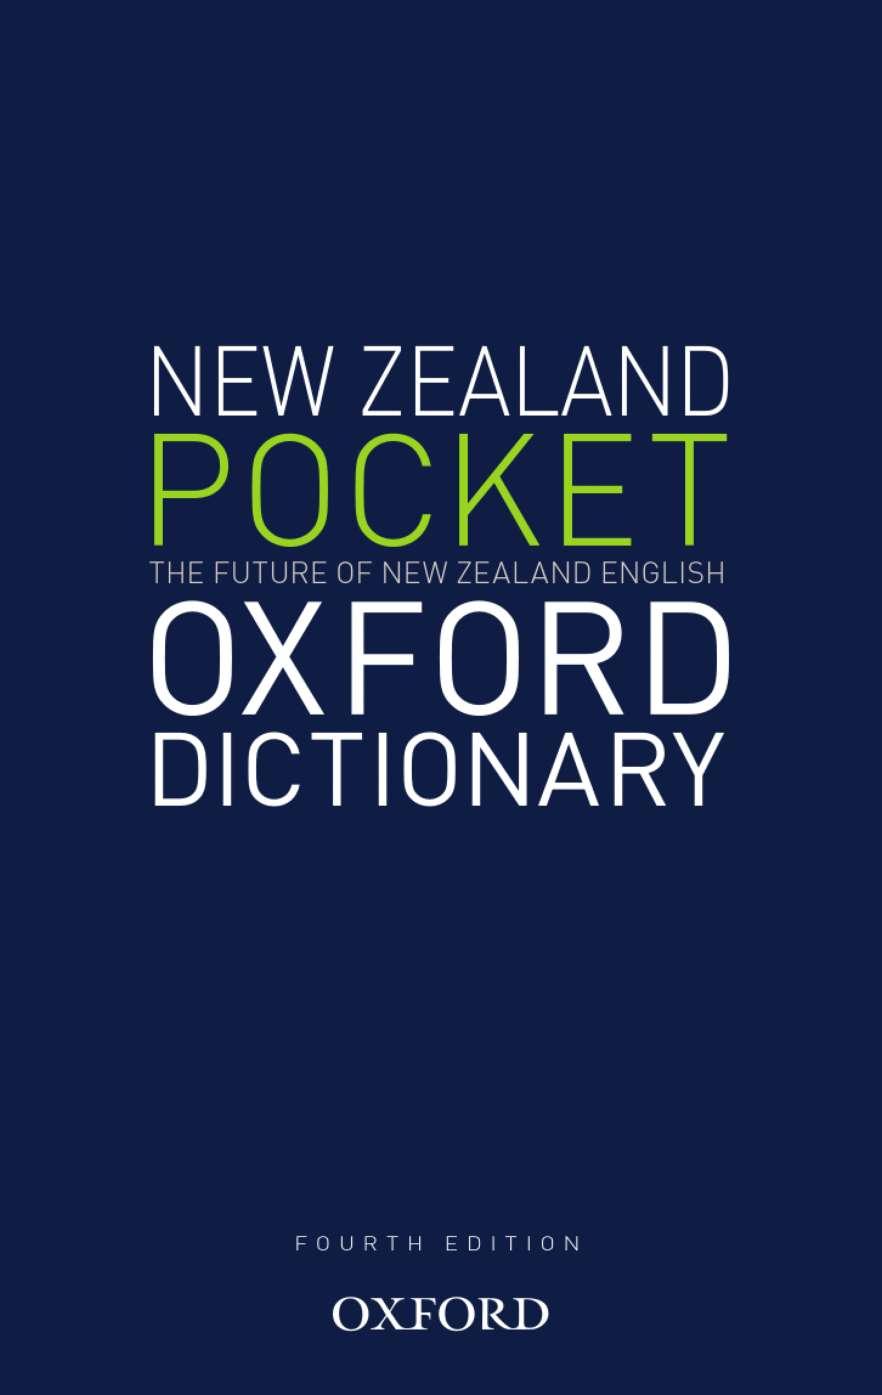 The New Zealand Pocket Oxford Dictionary